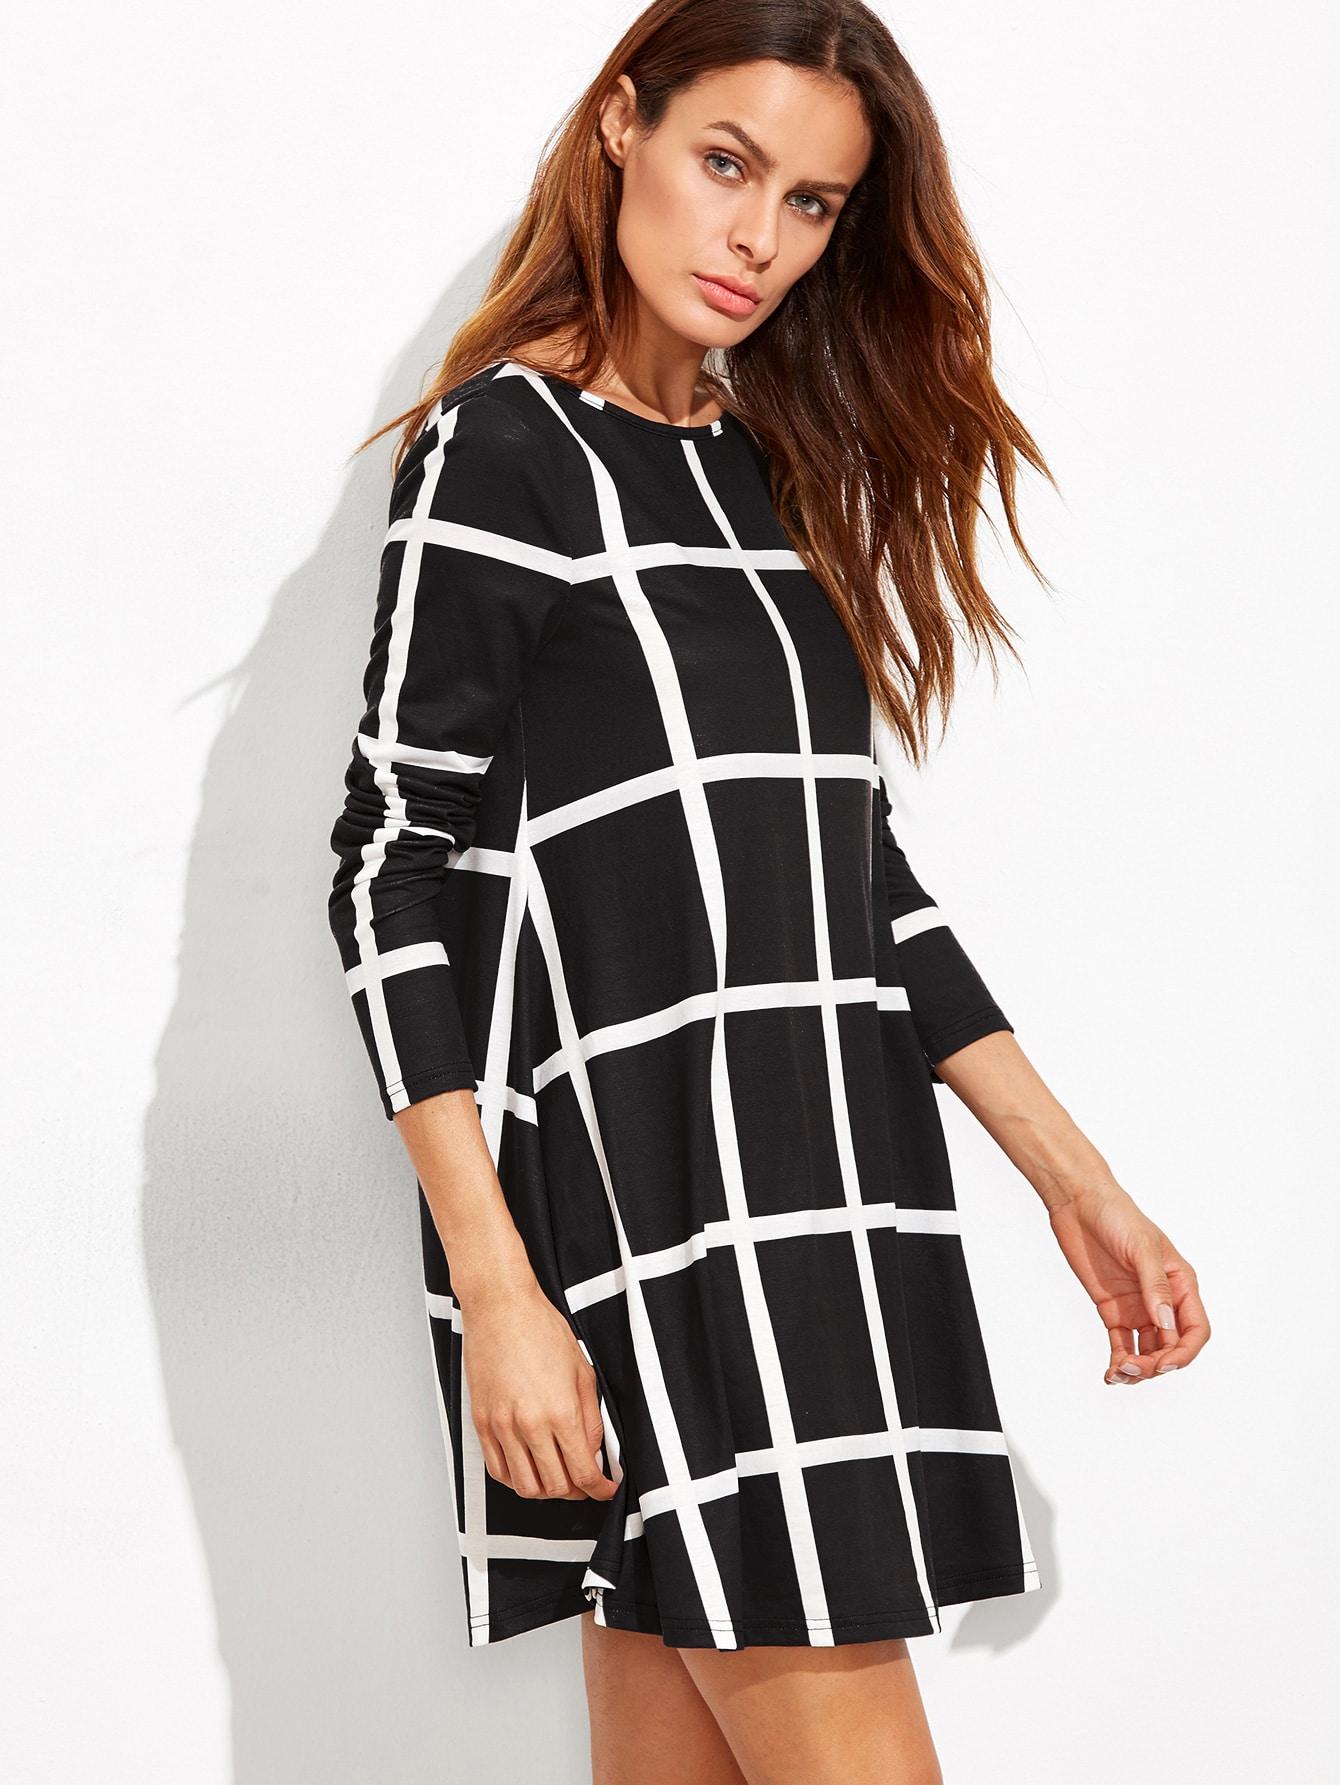 ed1f52e3db4e All Piko Styles   Tops, Tunics, Dresses, 3/4 Sleeve - Piko .